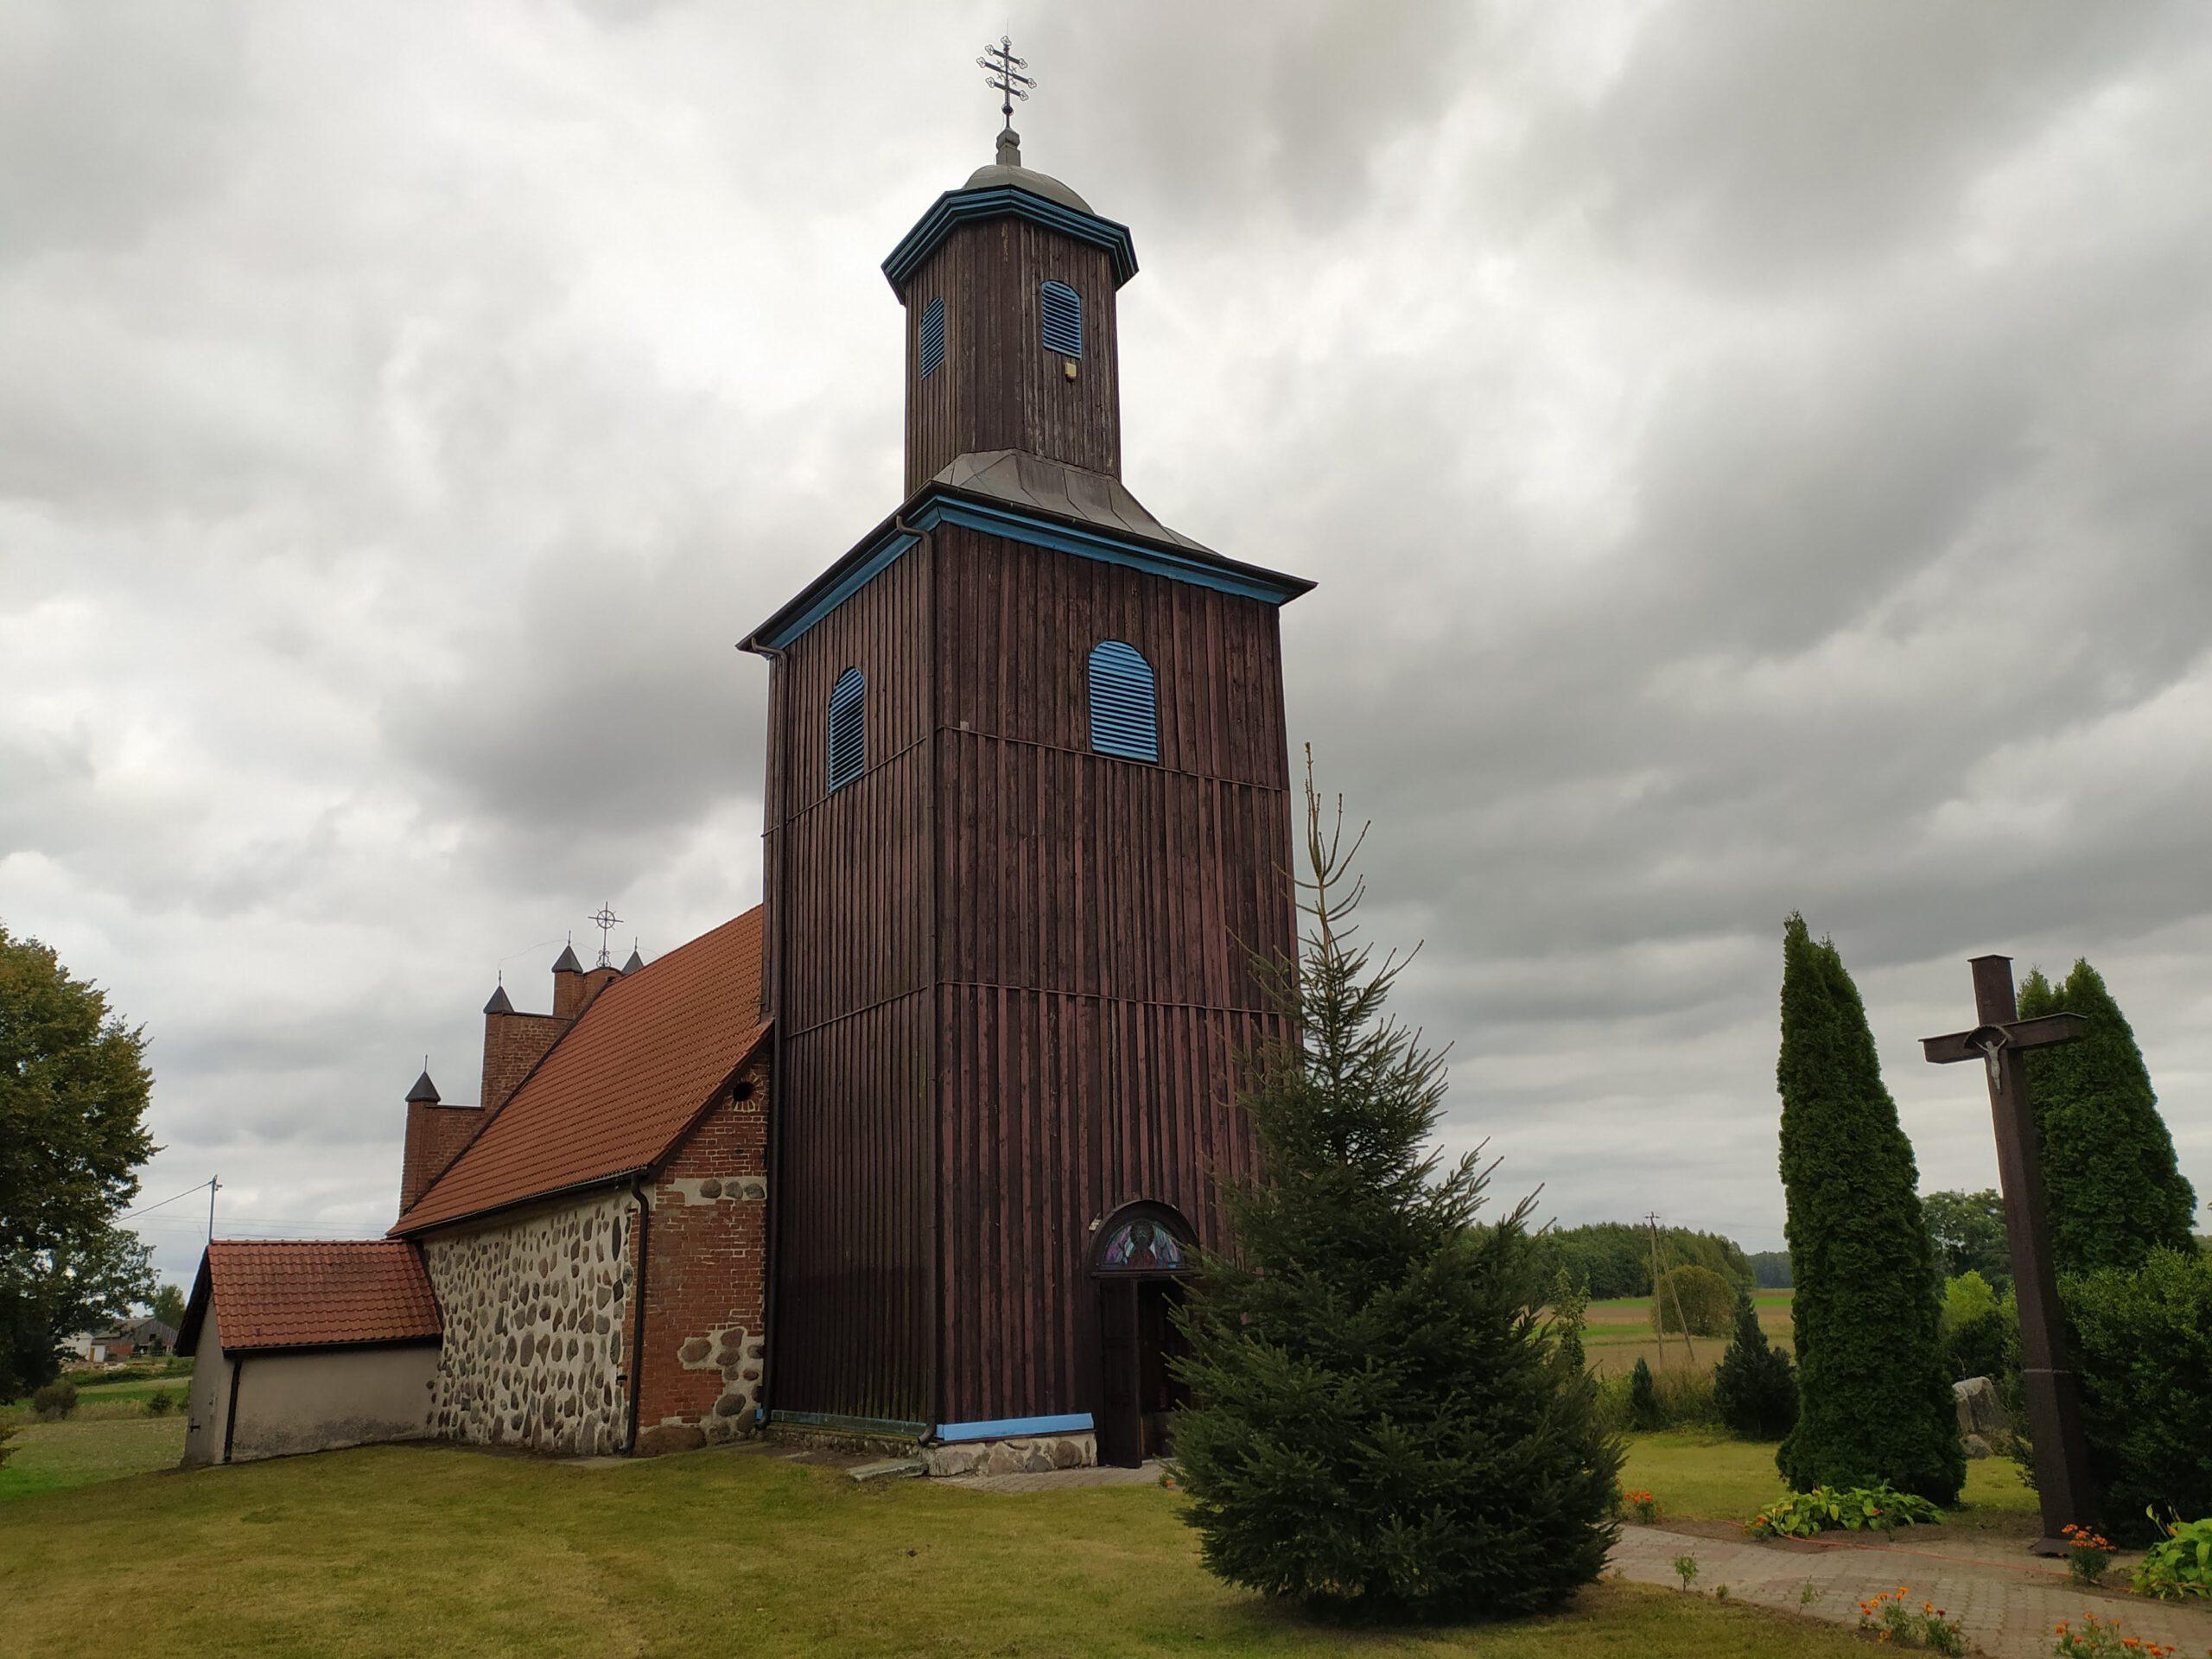 Cerkiew Grekokatolicka we wsi Ostre Bardo